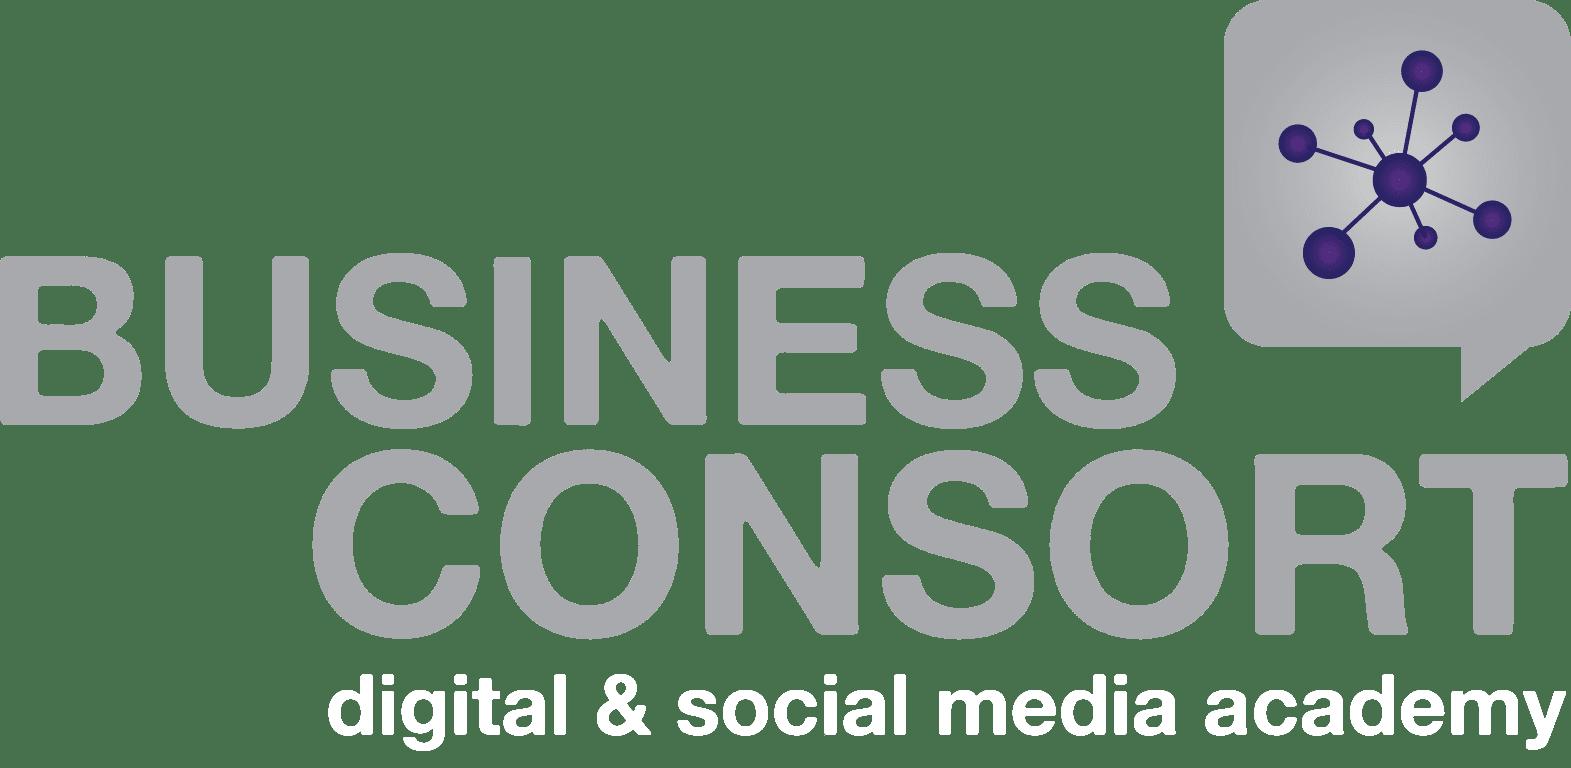 Business Consort Digital & Social Media Academy